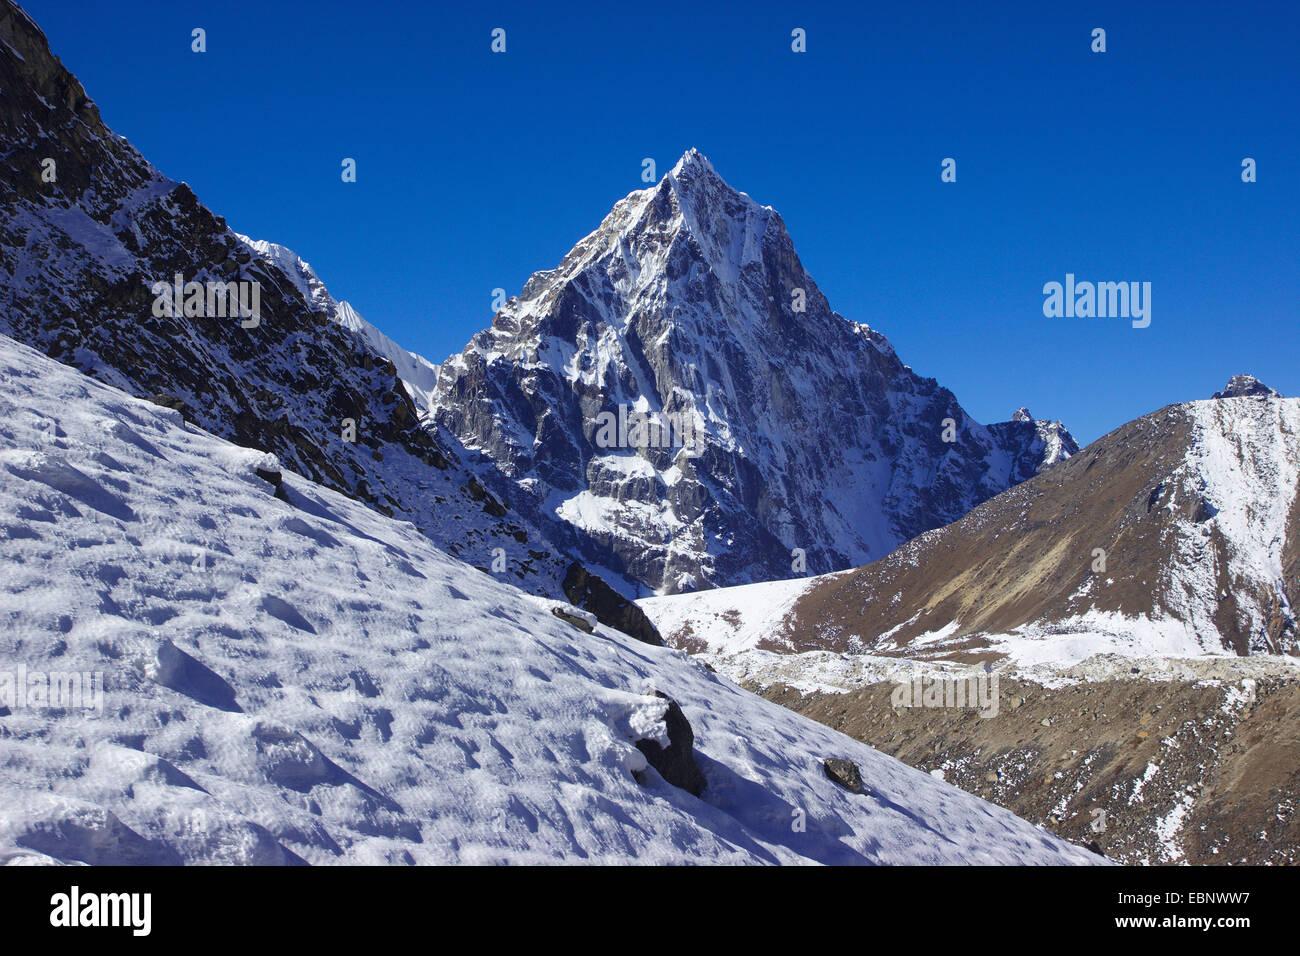 view from ascent to Kongma La to Cholatse, Nepal, Himalaya, Khumbu Himal - Stock Image